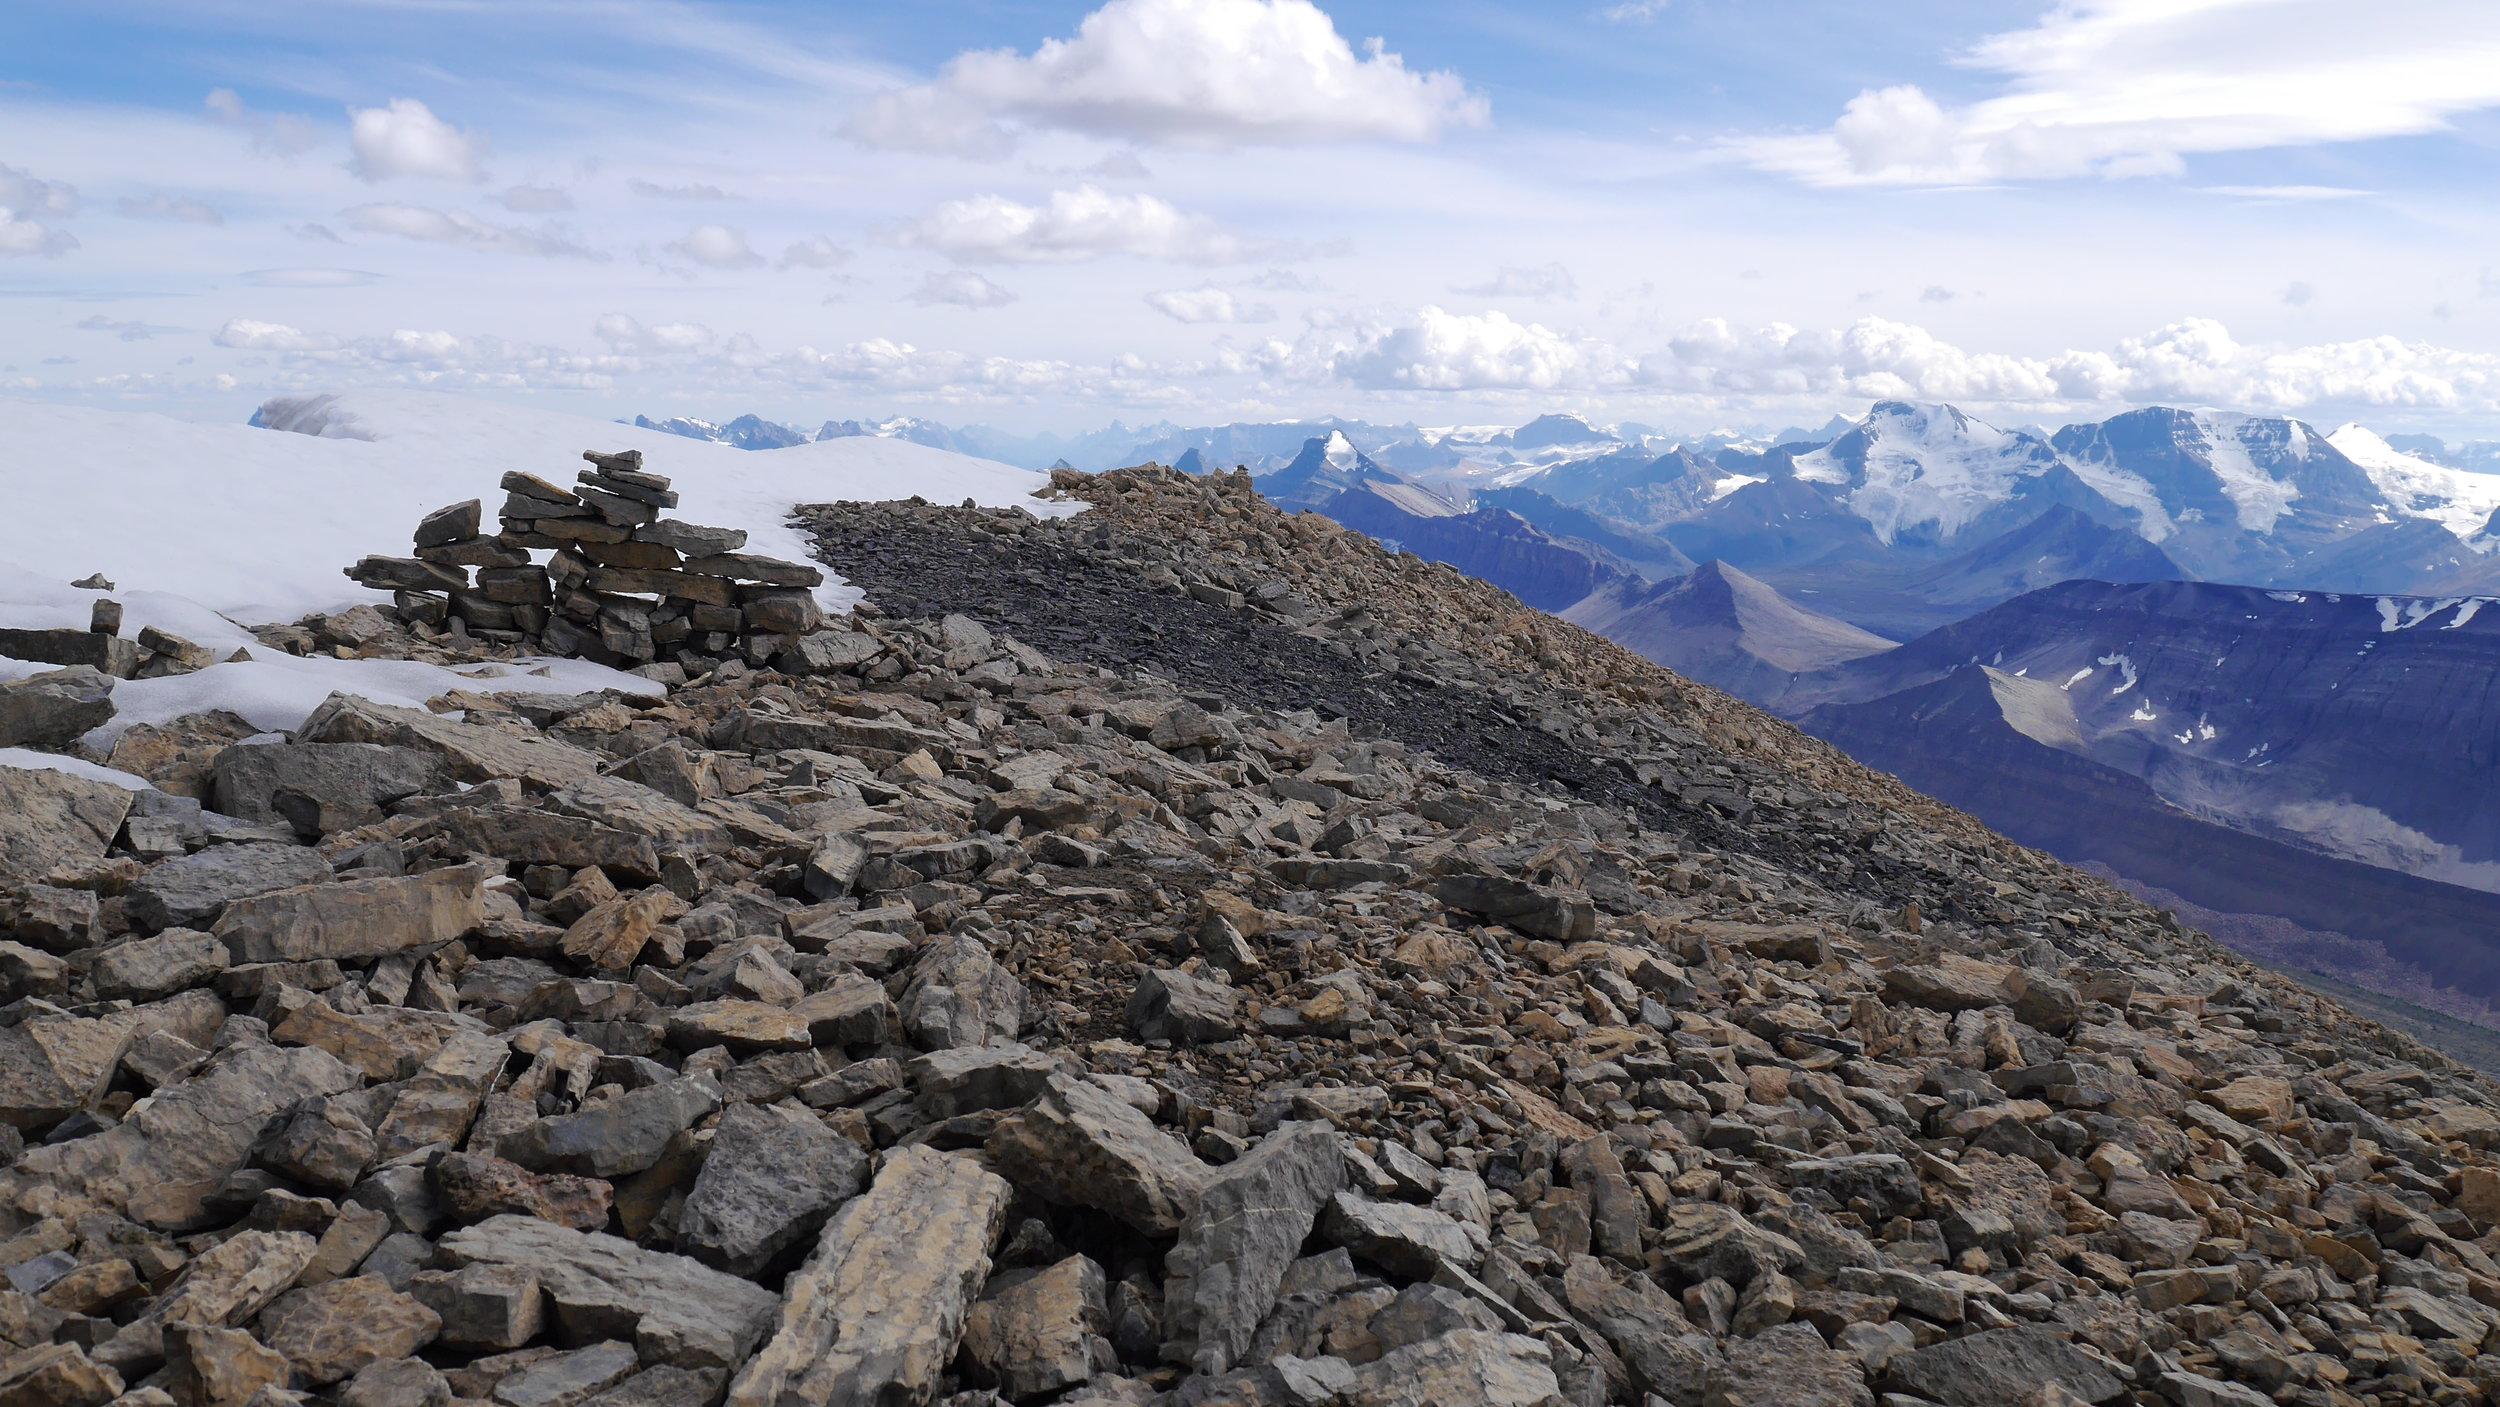 The summit of Sunwapta Peak 3,315m